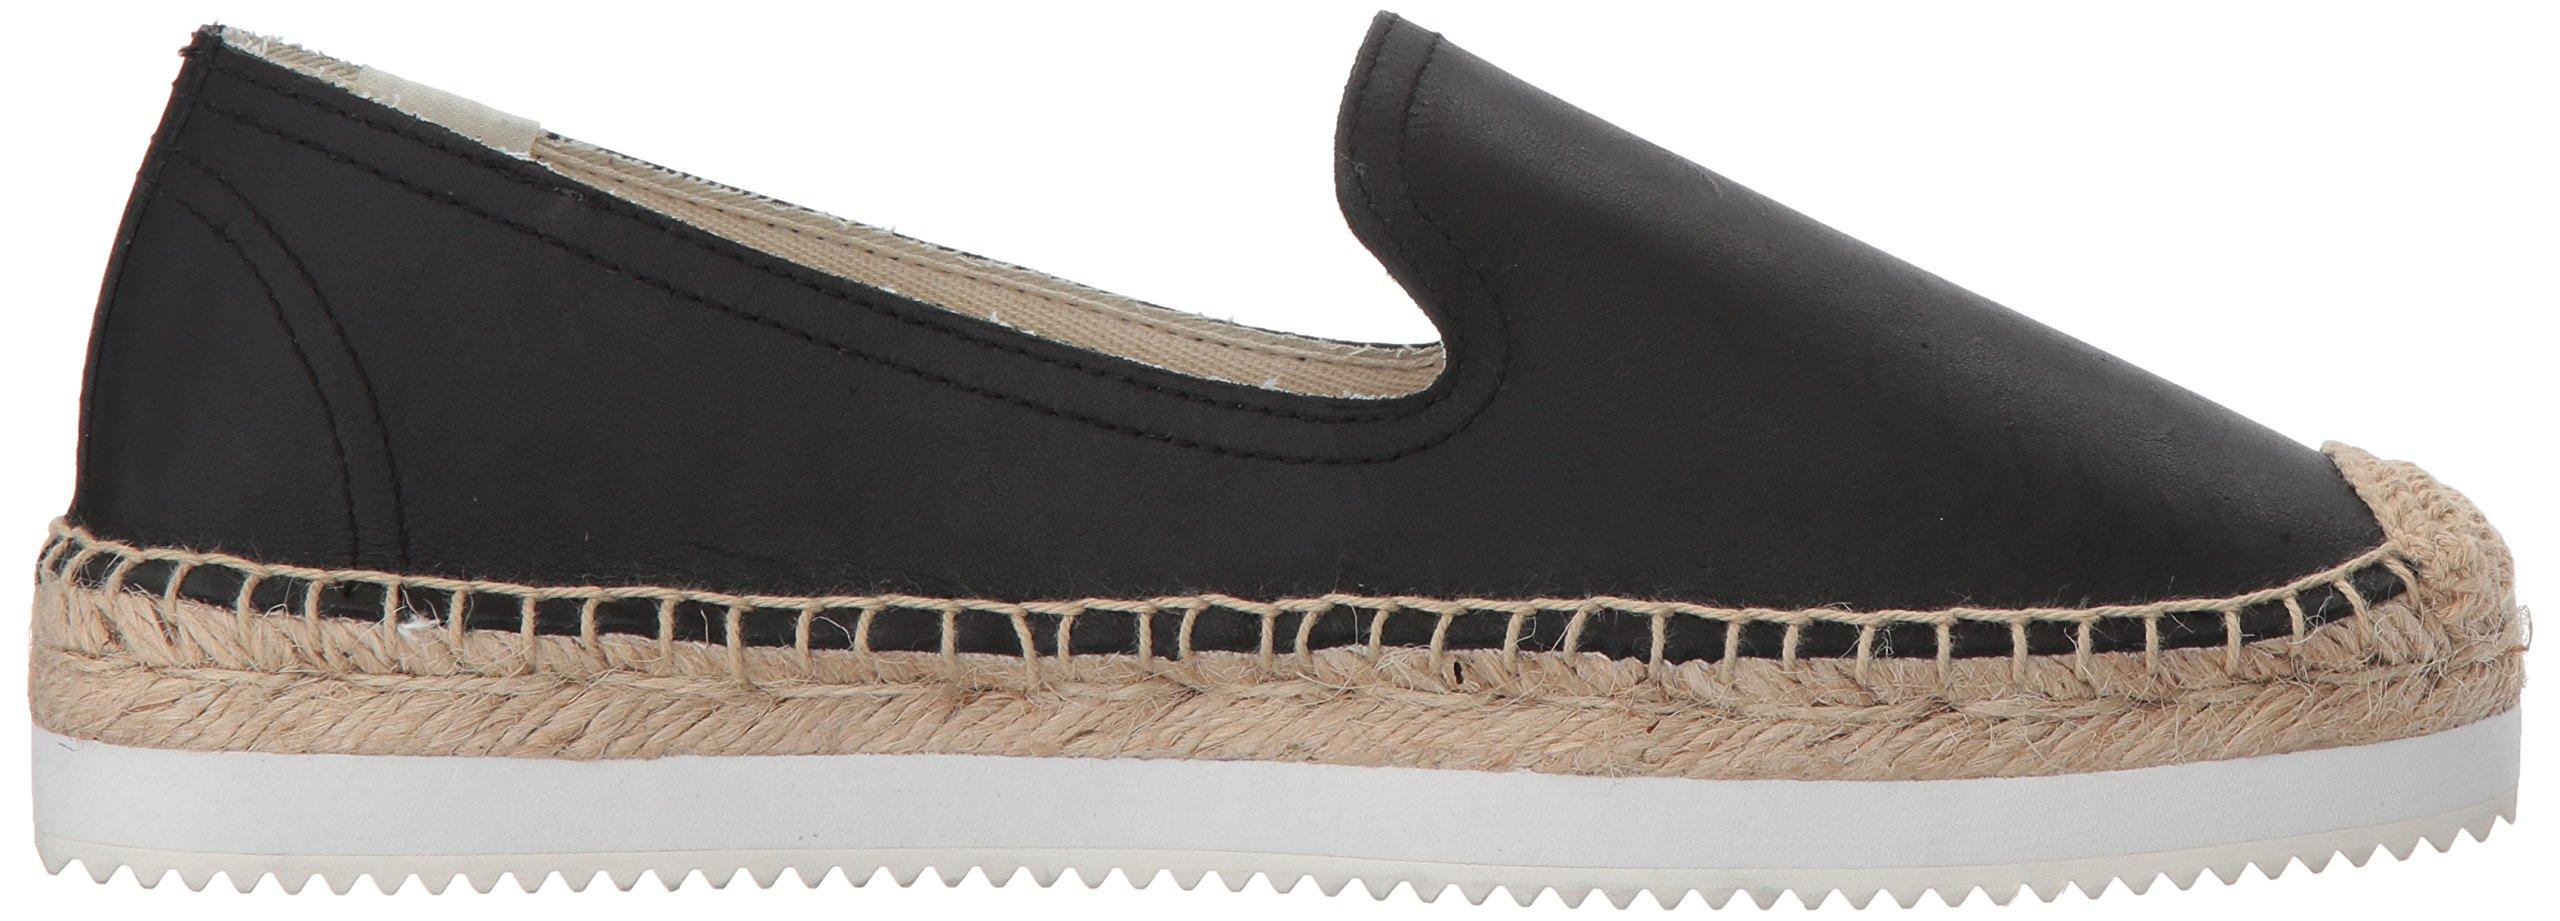 Soludos Women's MIX Sole Smkg Slipper Platform, Black, 8.5 B US by Soludos (Image #7)